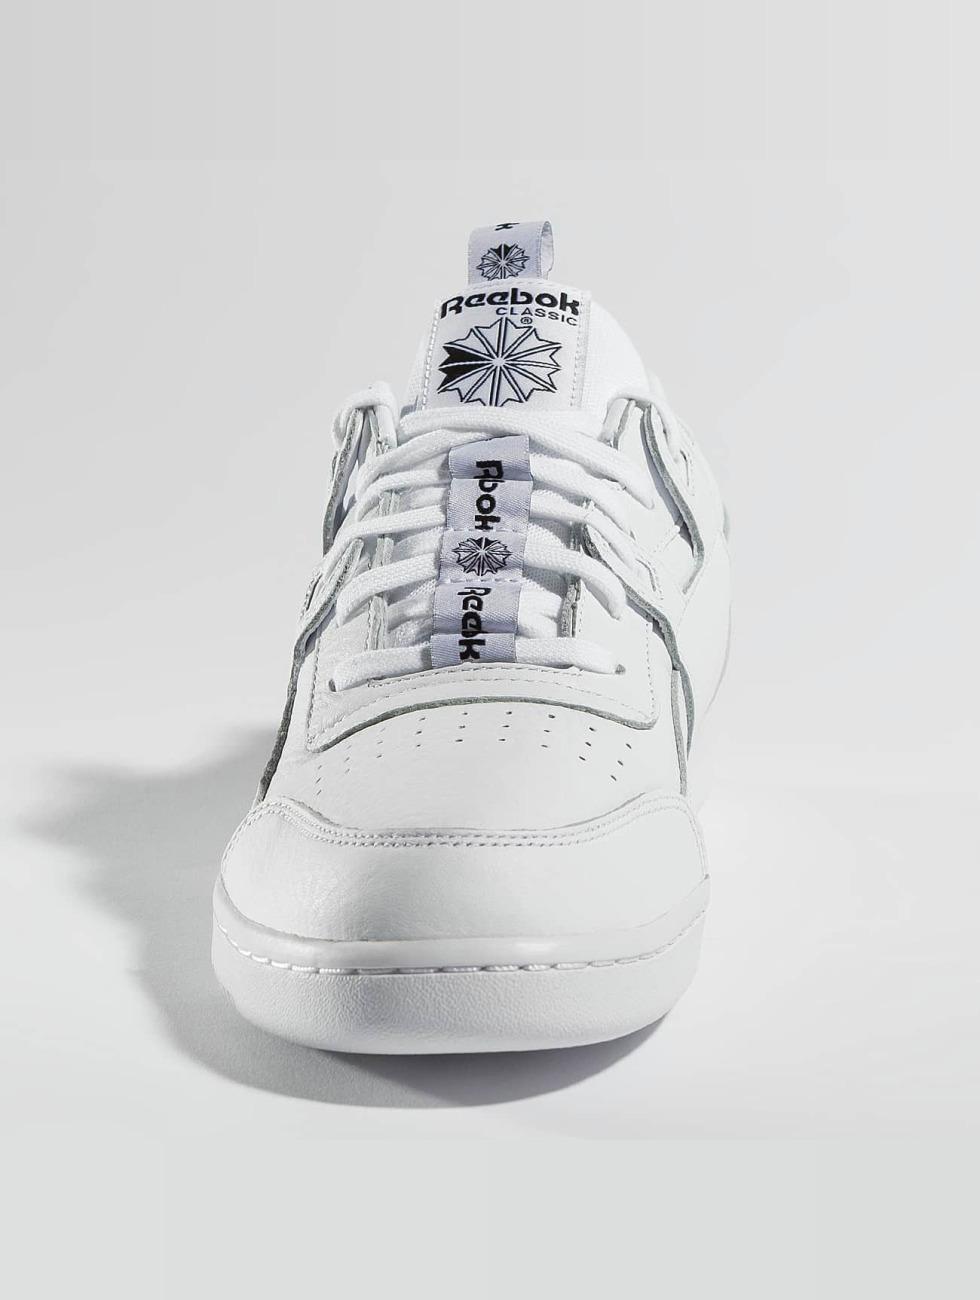 Keuze Goedkope Prijs Goede Deals Reebok schoen / sneaker Workout Plus IT in wit 365039 Goedkope Koop Low Cost 100% Authentiek Te Koop AS3VX